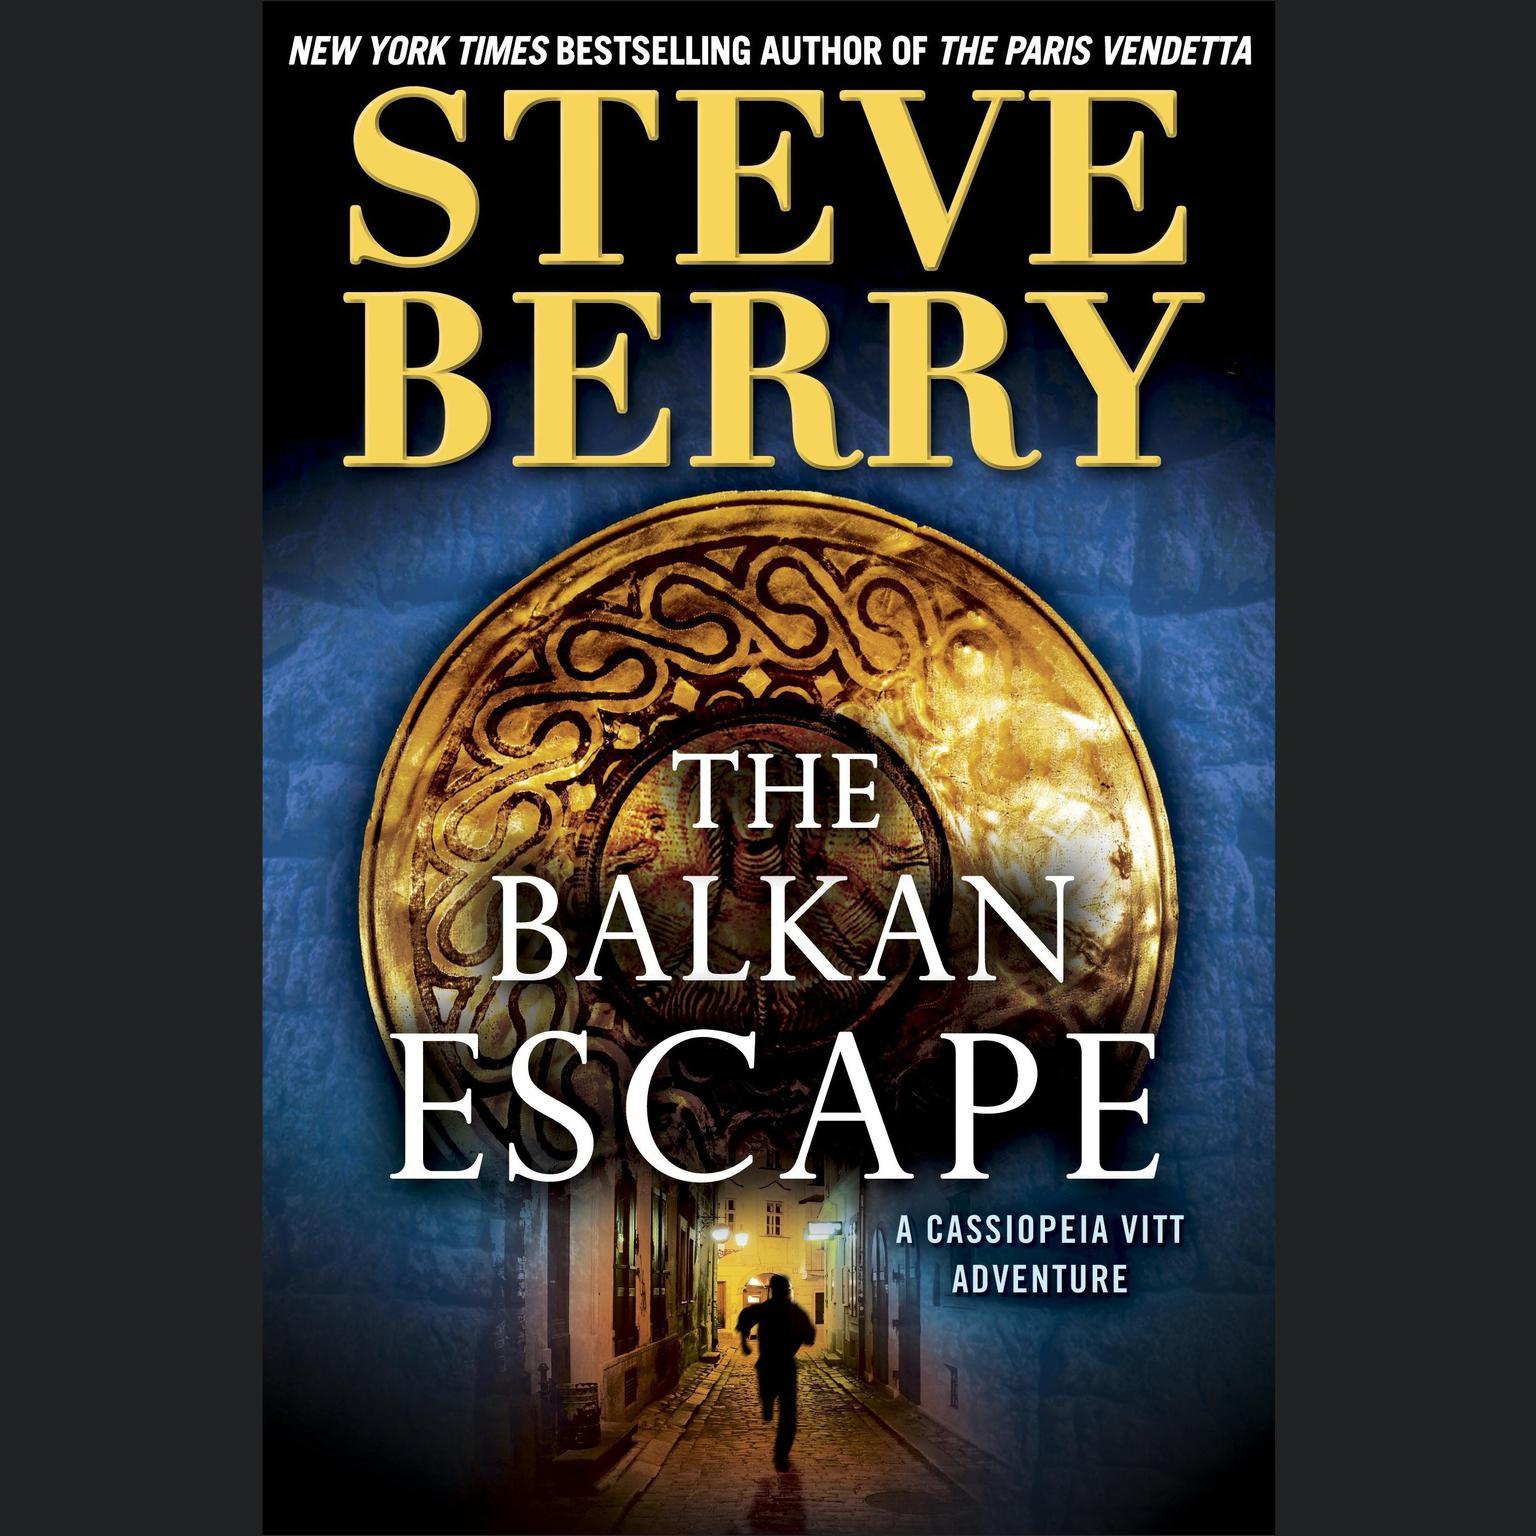 Printable The Balkan Escape (Short Story): A Cassiopeia Vitt Adventure Audiobook Cover Art